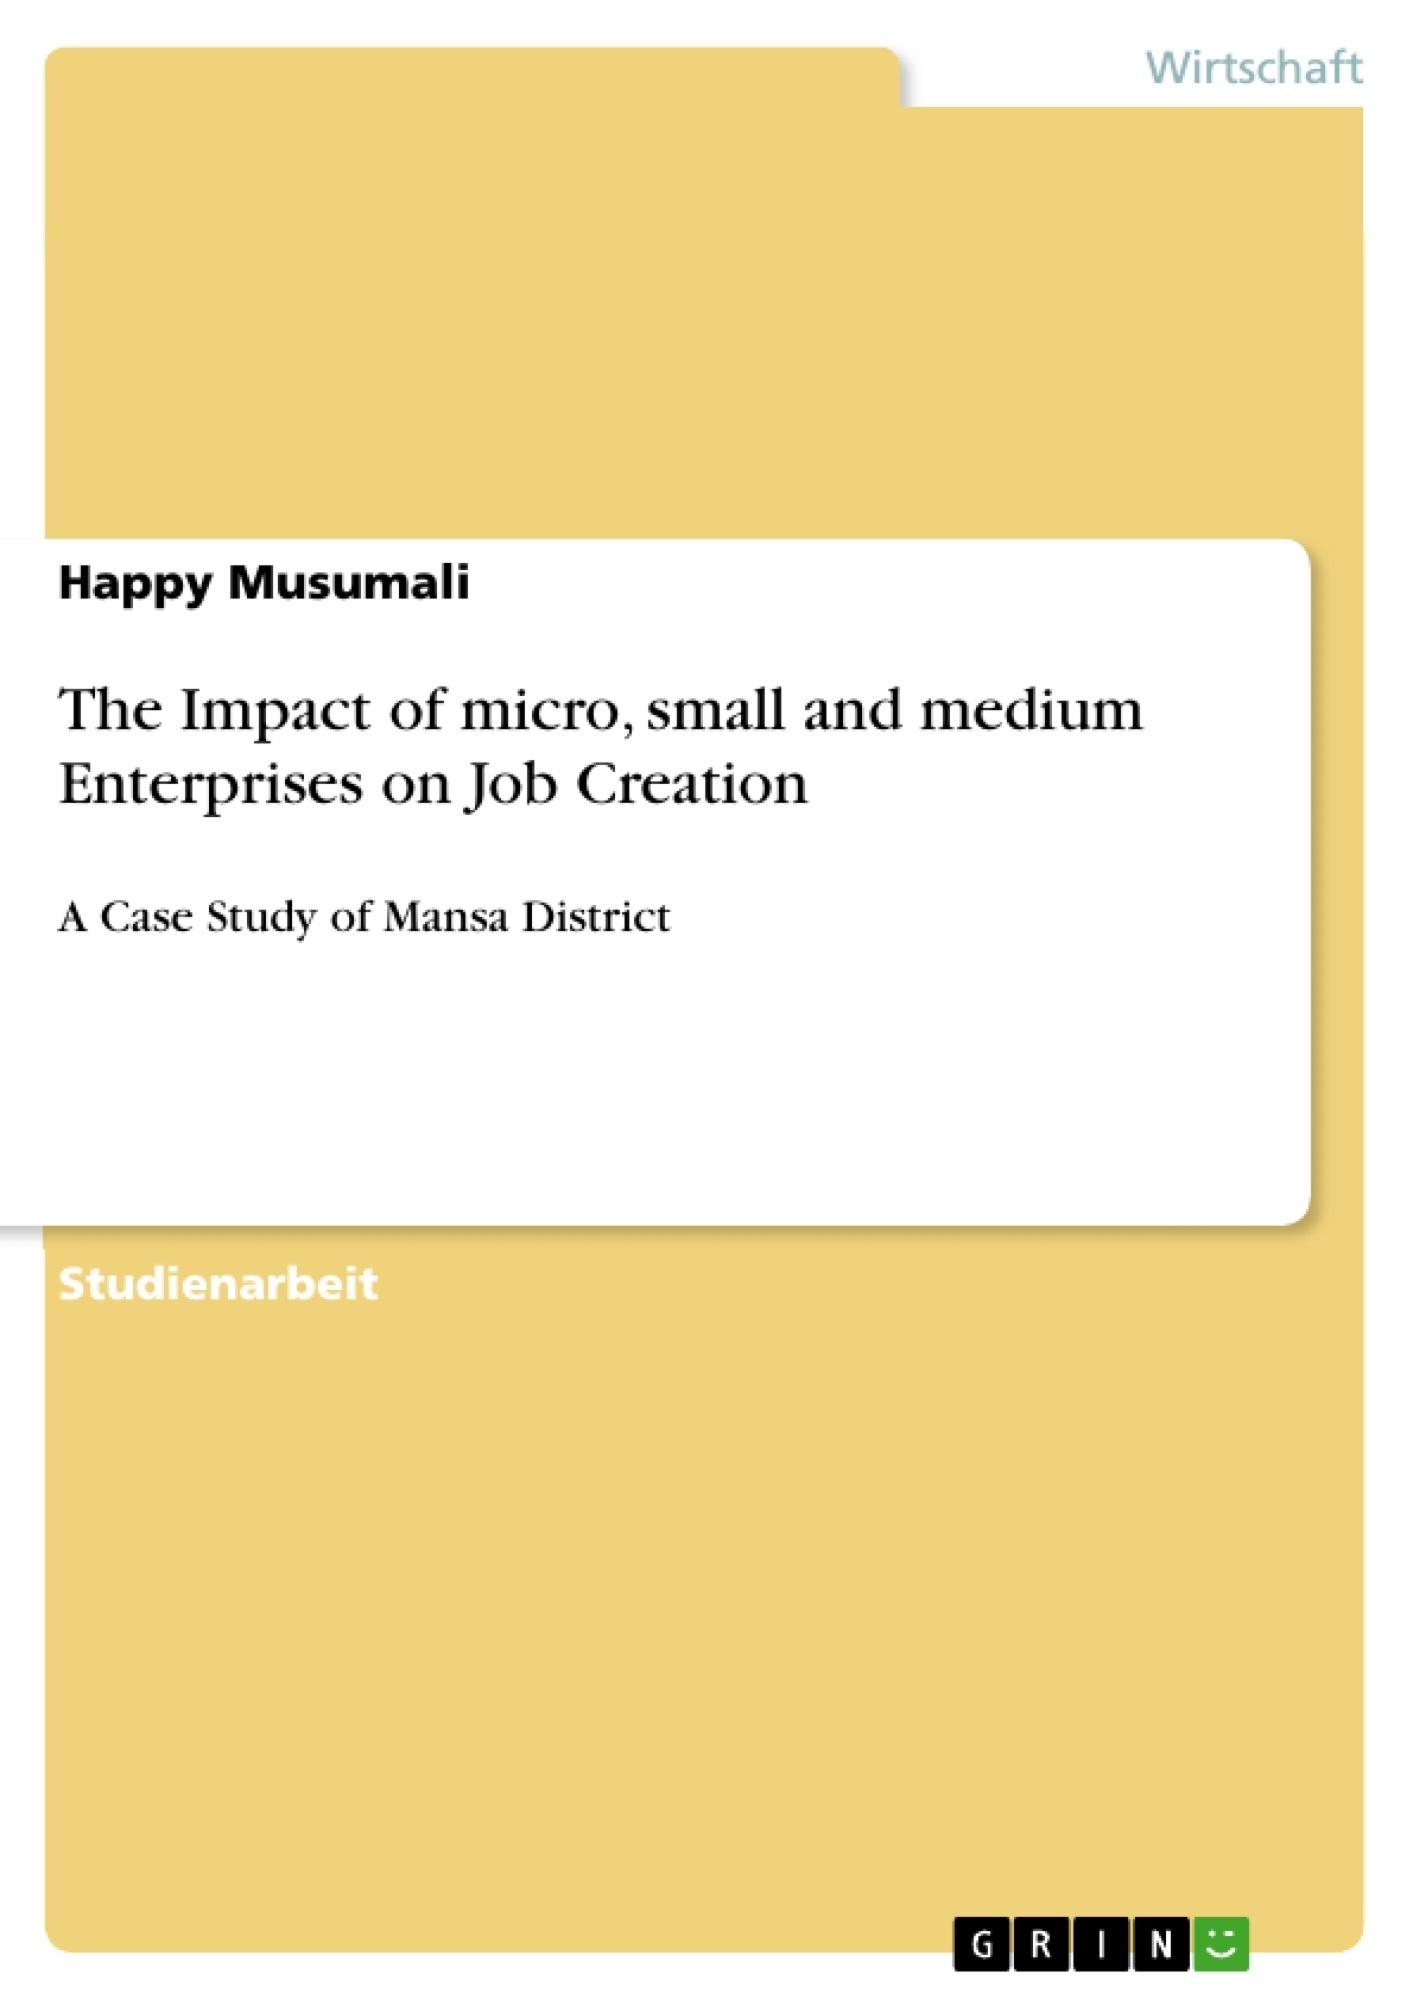 Titel: The Impact of micro, small and medium Enterprises on Job Creation